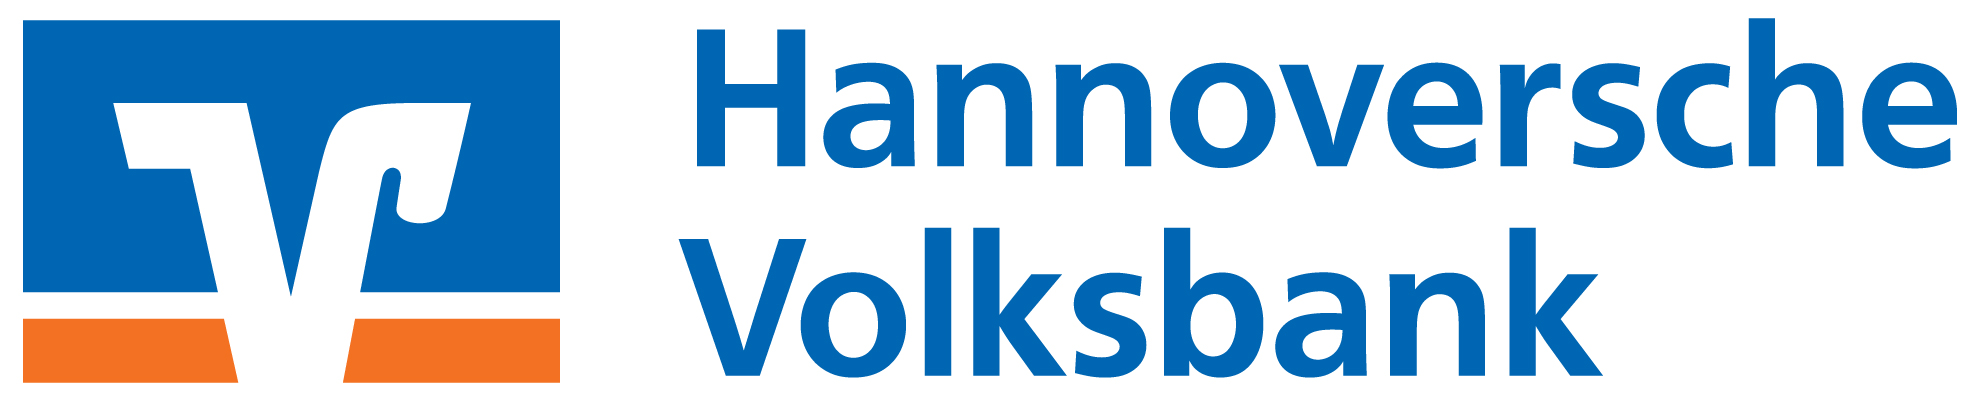 Hannoversche Volksbank eG Geldautomat Garbsen (Shopping-Plaza)